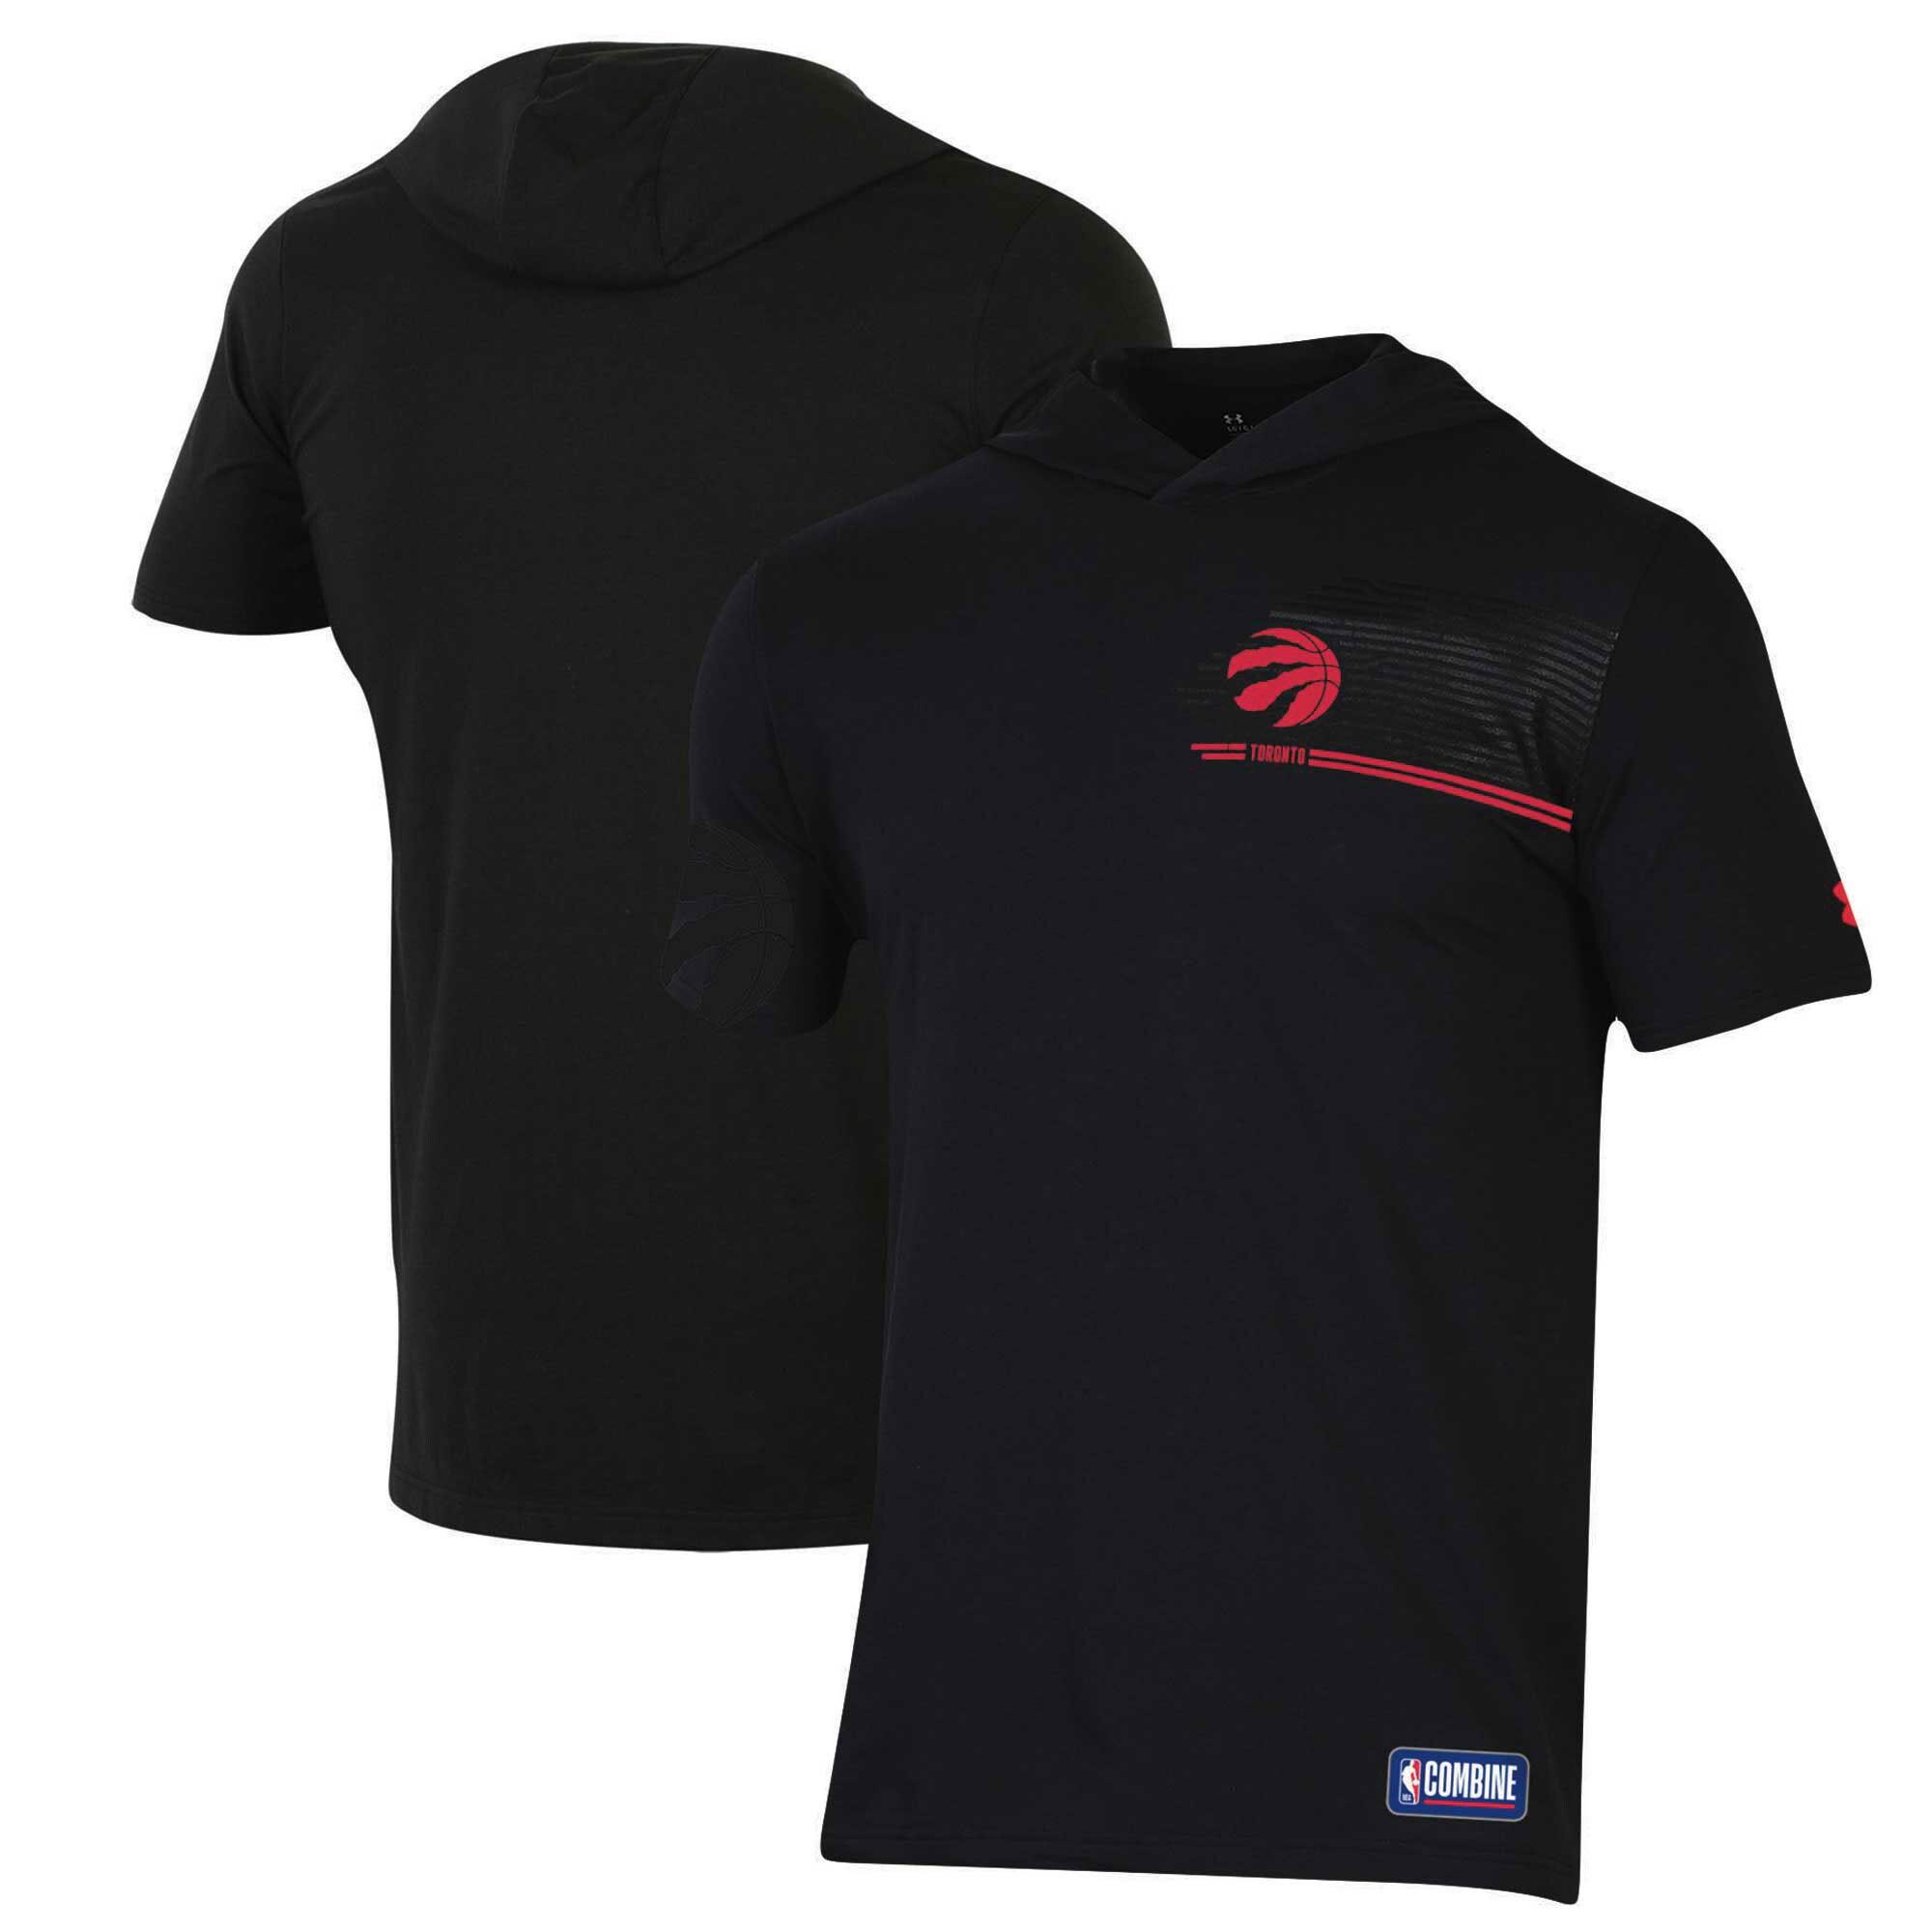 Toronto Raptors Under Armour Combine Authentic Baseline Hoodie Performance T-Shirt - Black